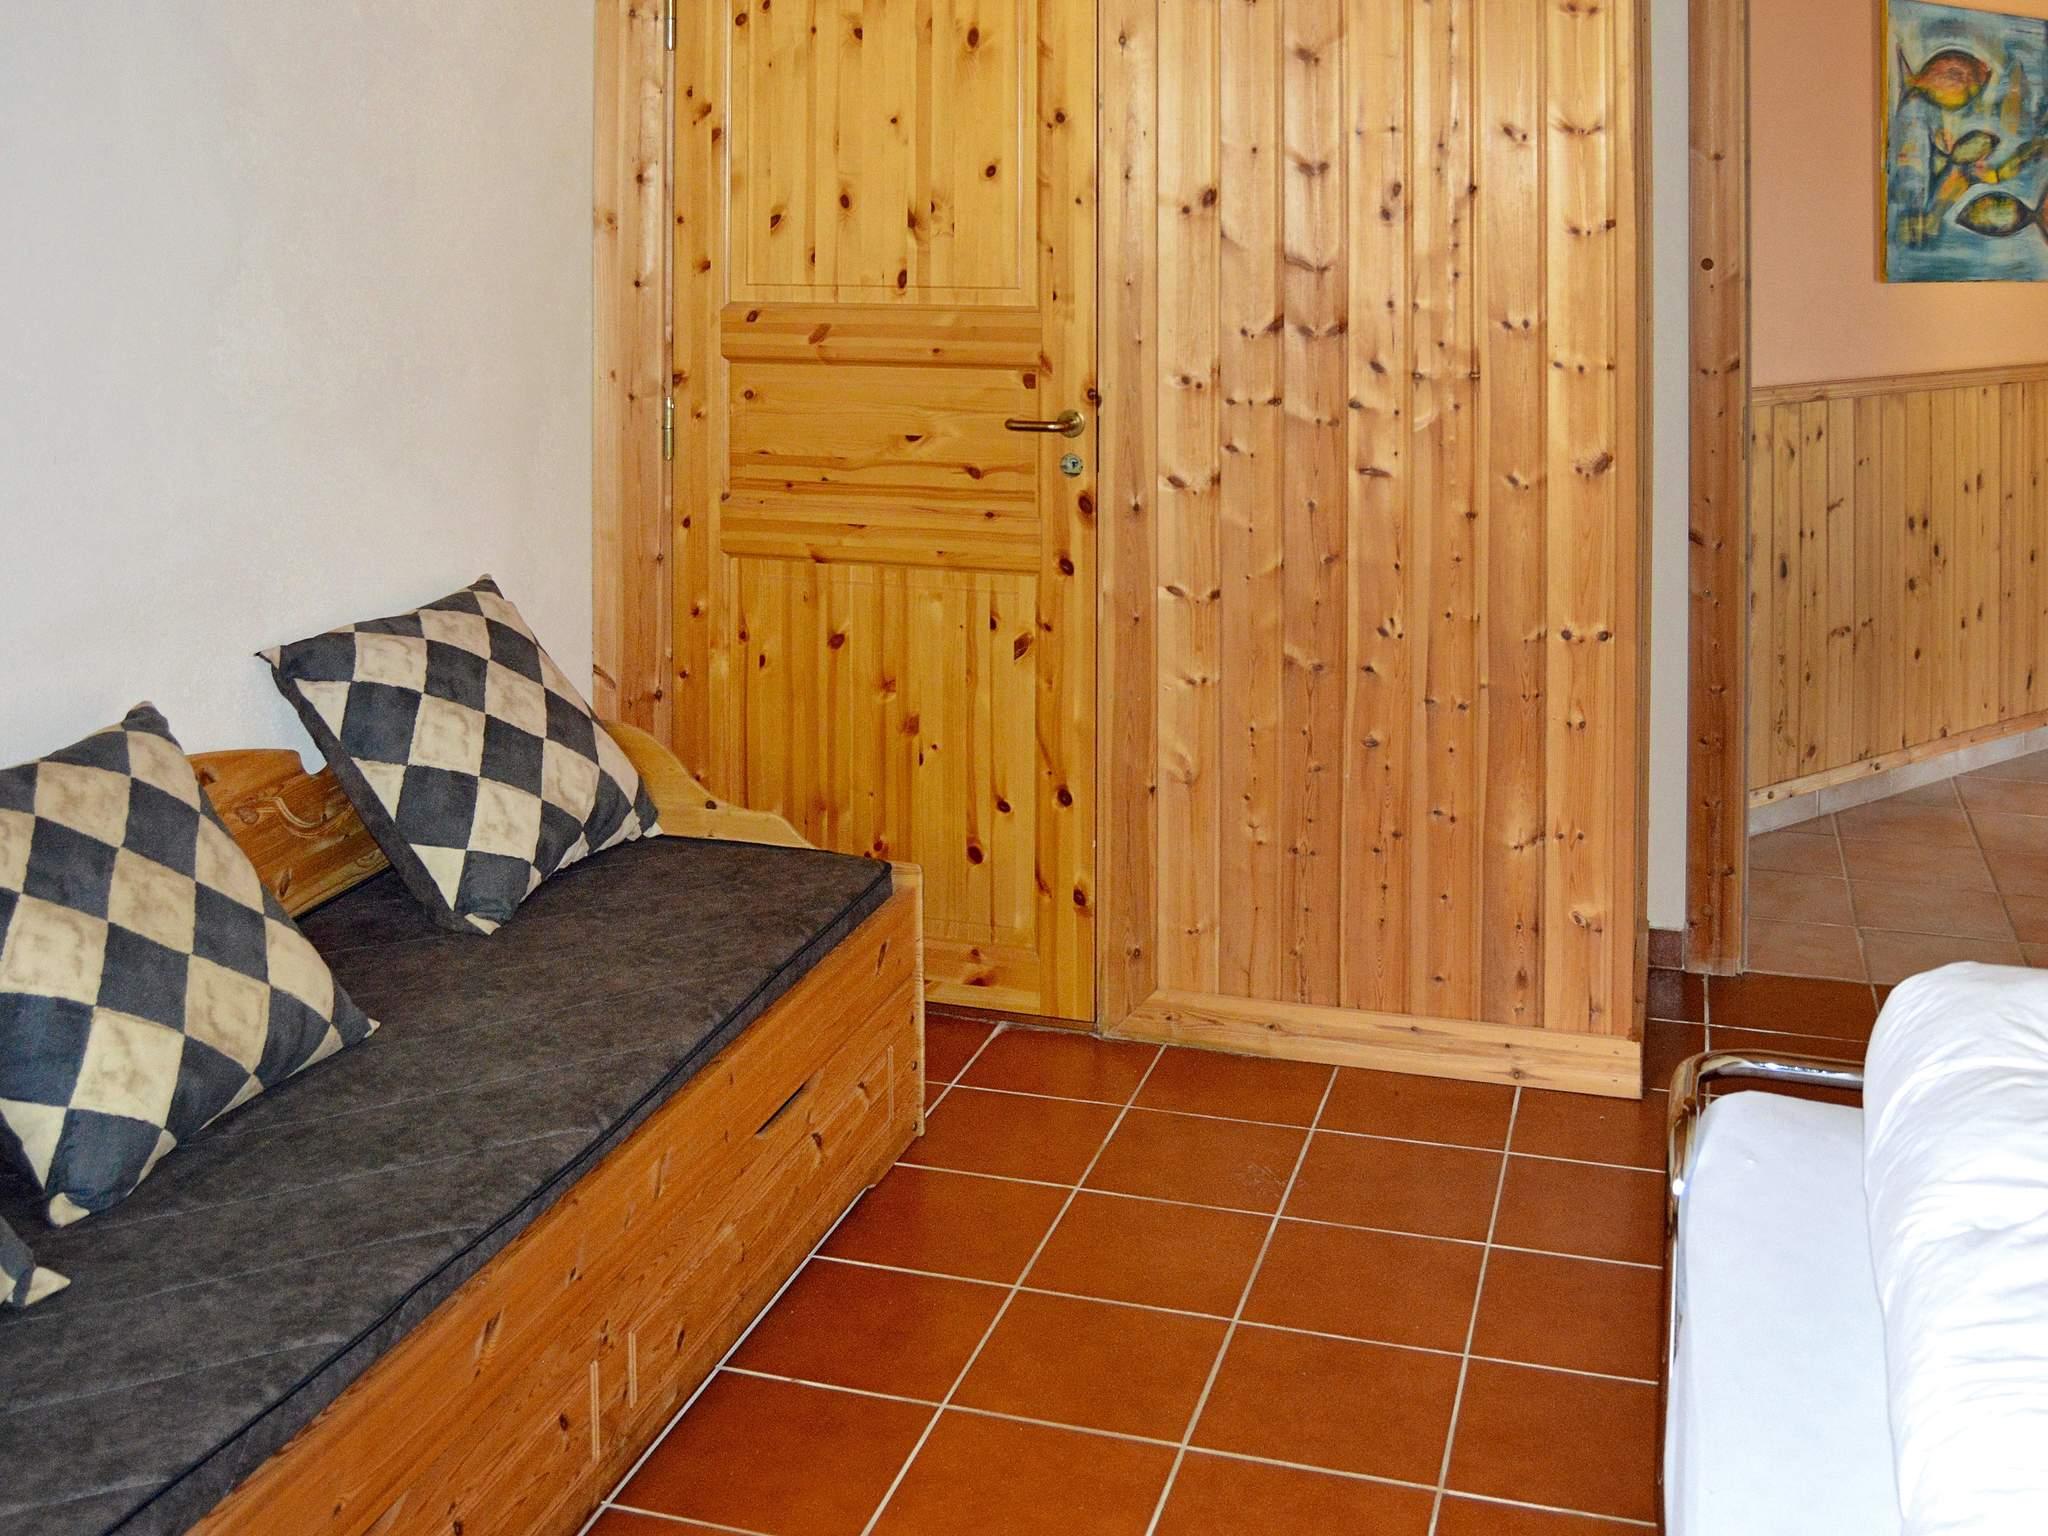 Ferienhaus Eidsvåg (84695), Eidsvåg, More - Romsdal, Westnorwegen, Norwegen, Bild 14